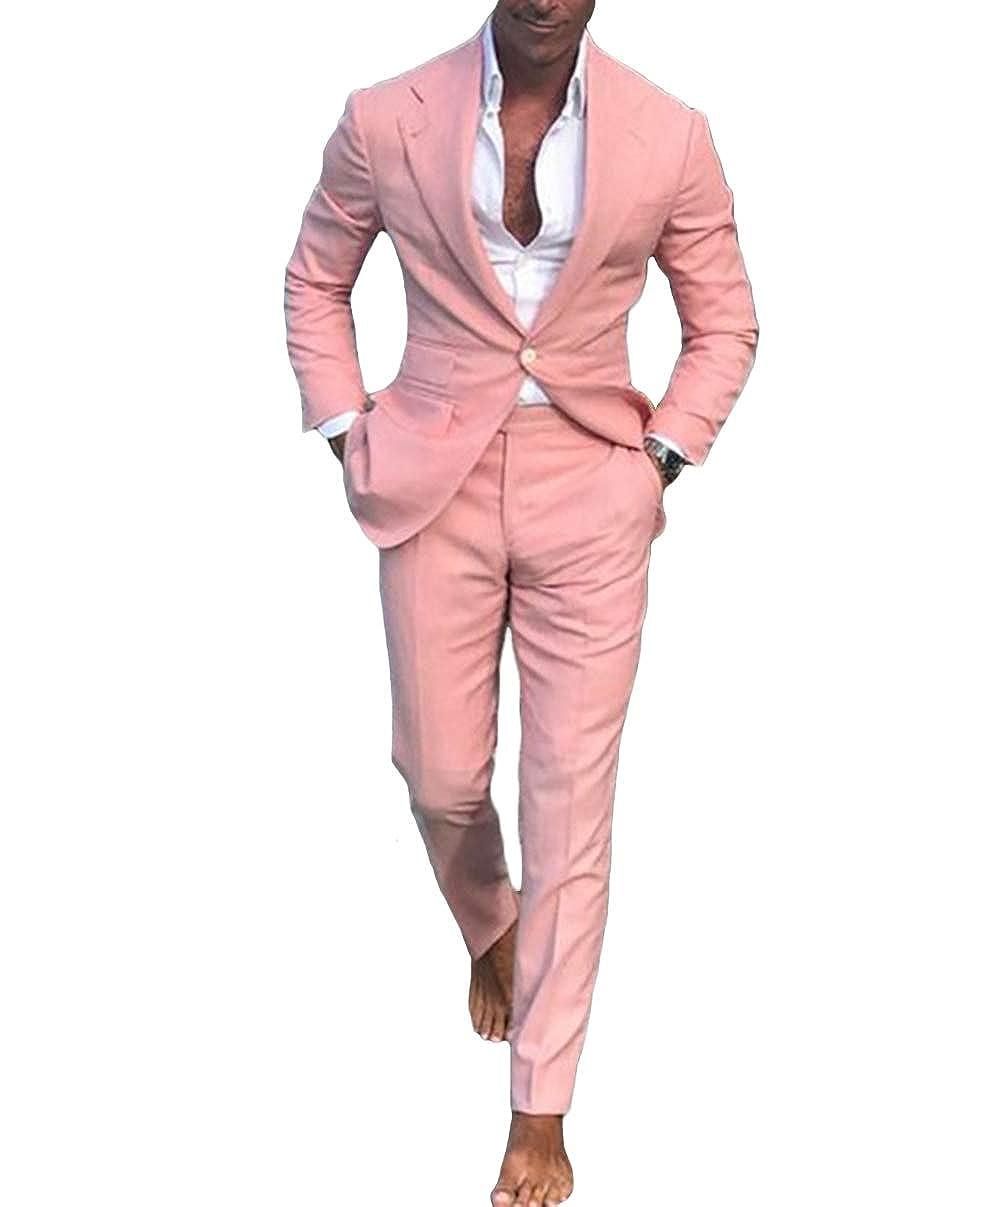 LYXP Men Summer Beach Men Suits Pink Suits for Wedding Ball Slim Fit Groom Best Men Male Suit 2 Pieces